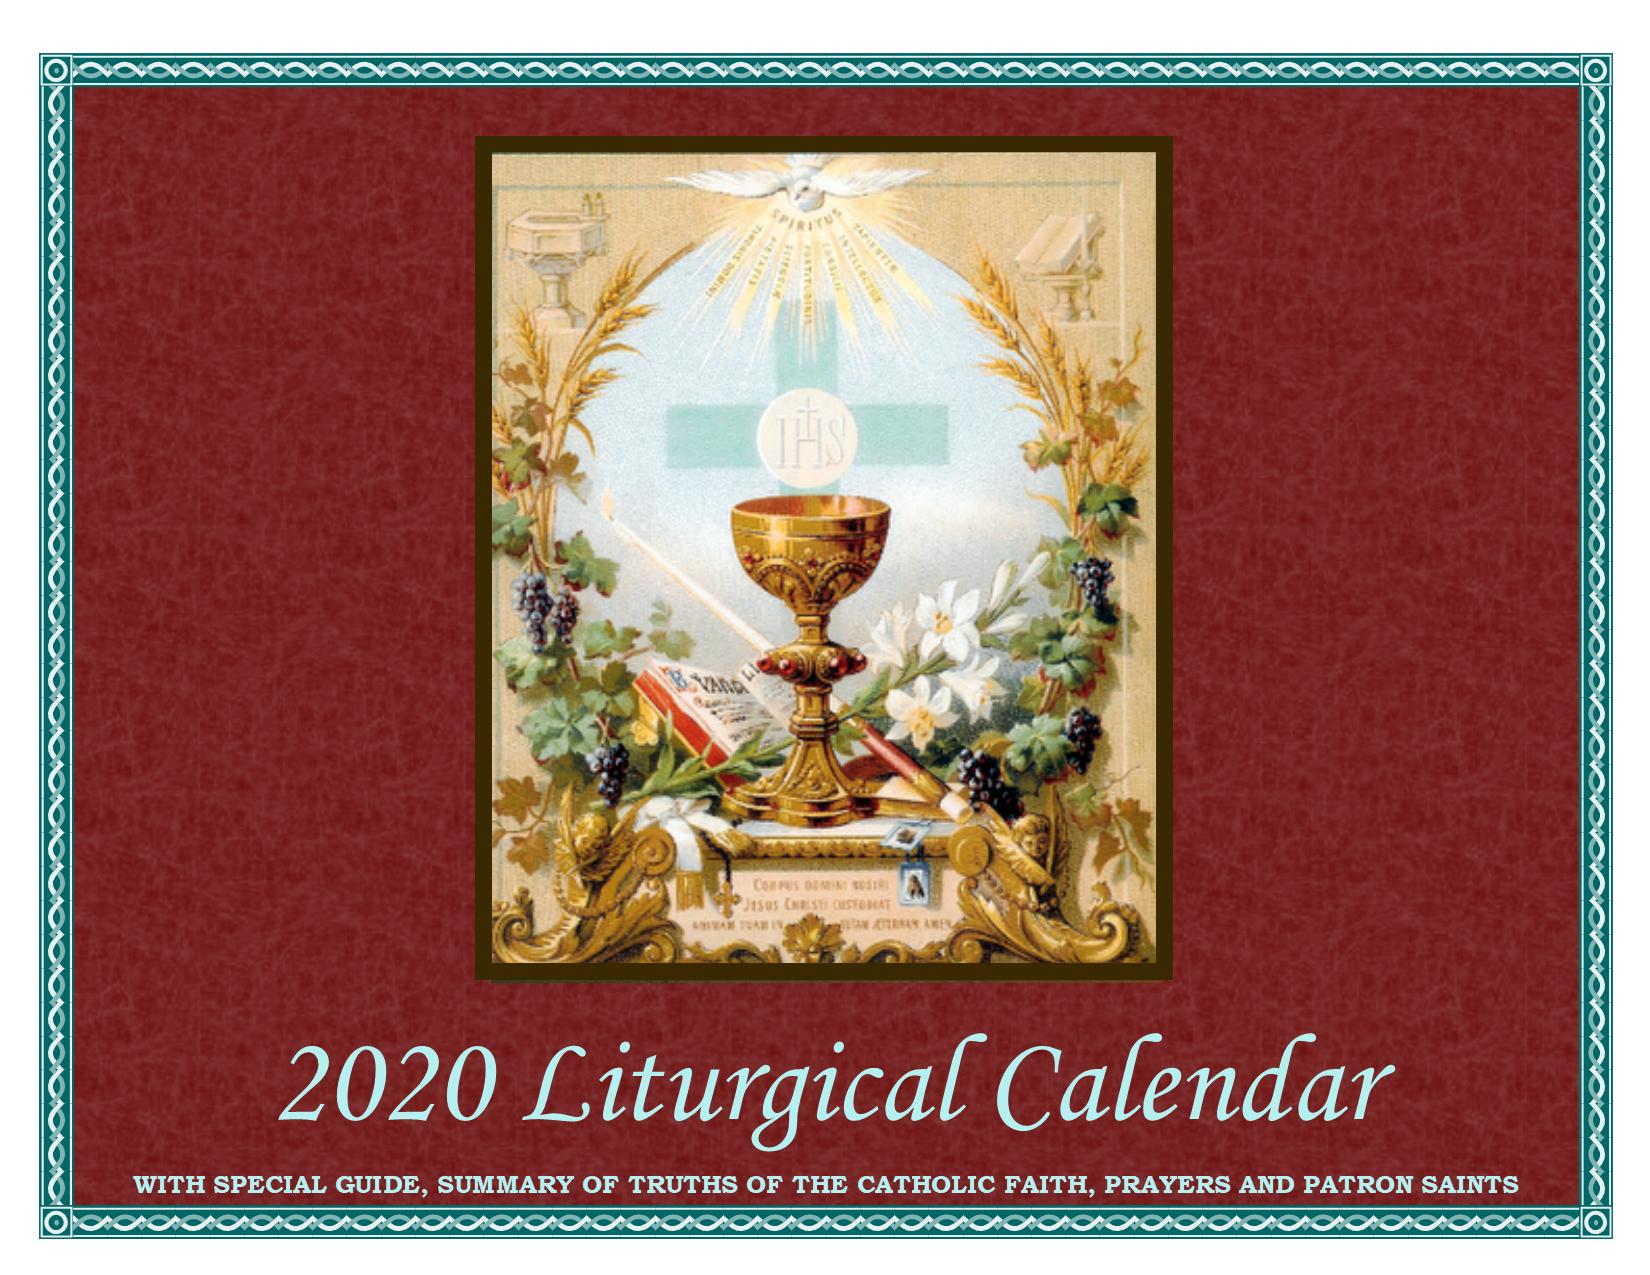 2020 Liturgical Calendar regarding 2020 Catholic Liturgical Calendar Activities